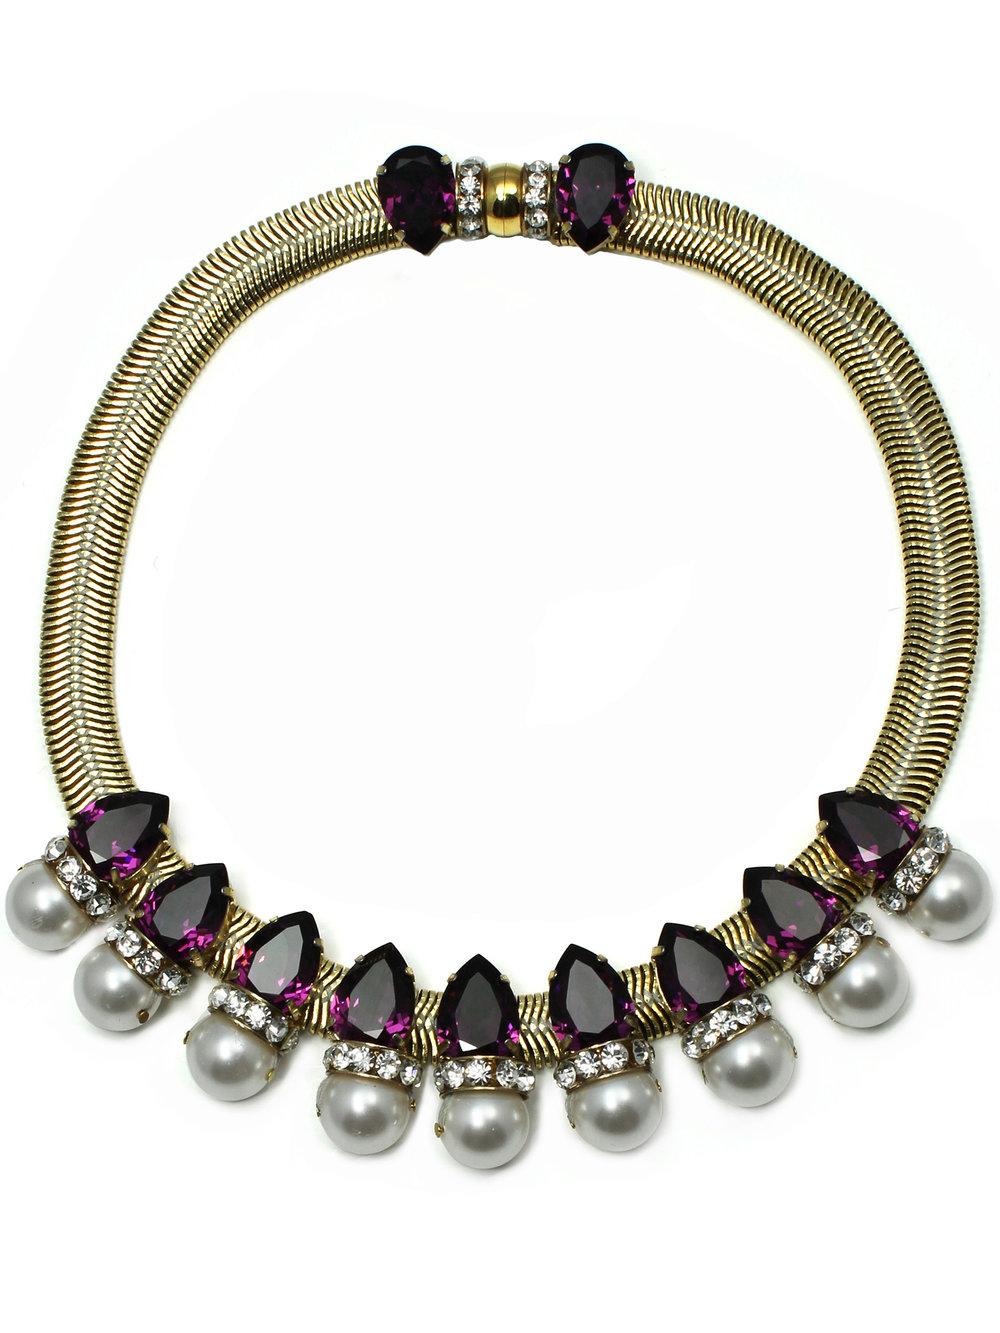 171N-PW Aragon Necklace - Purple_White.jpg